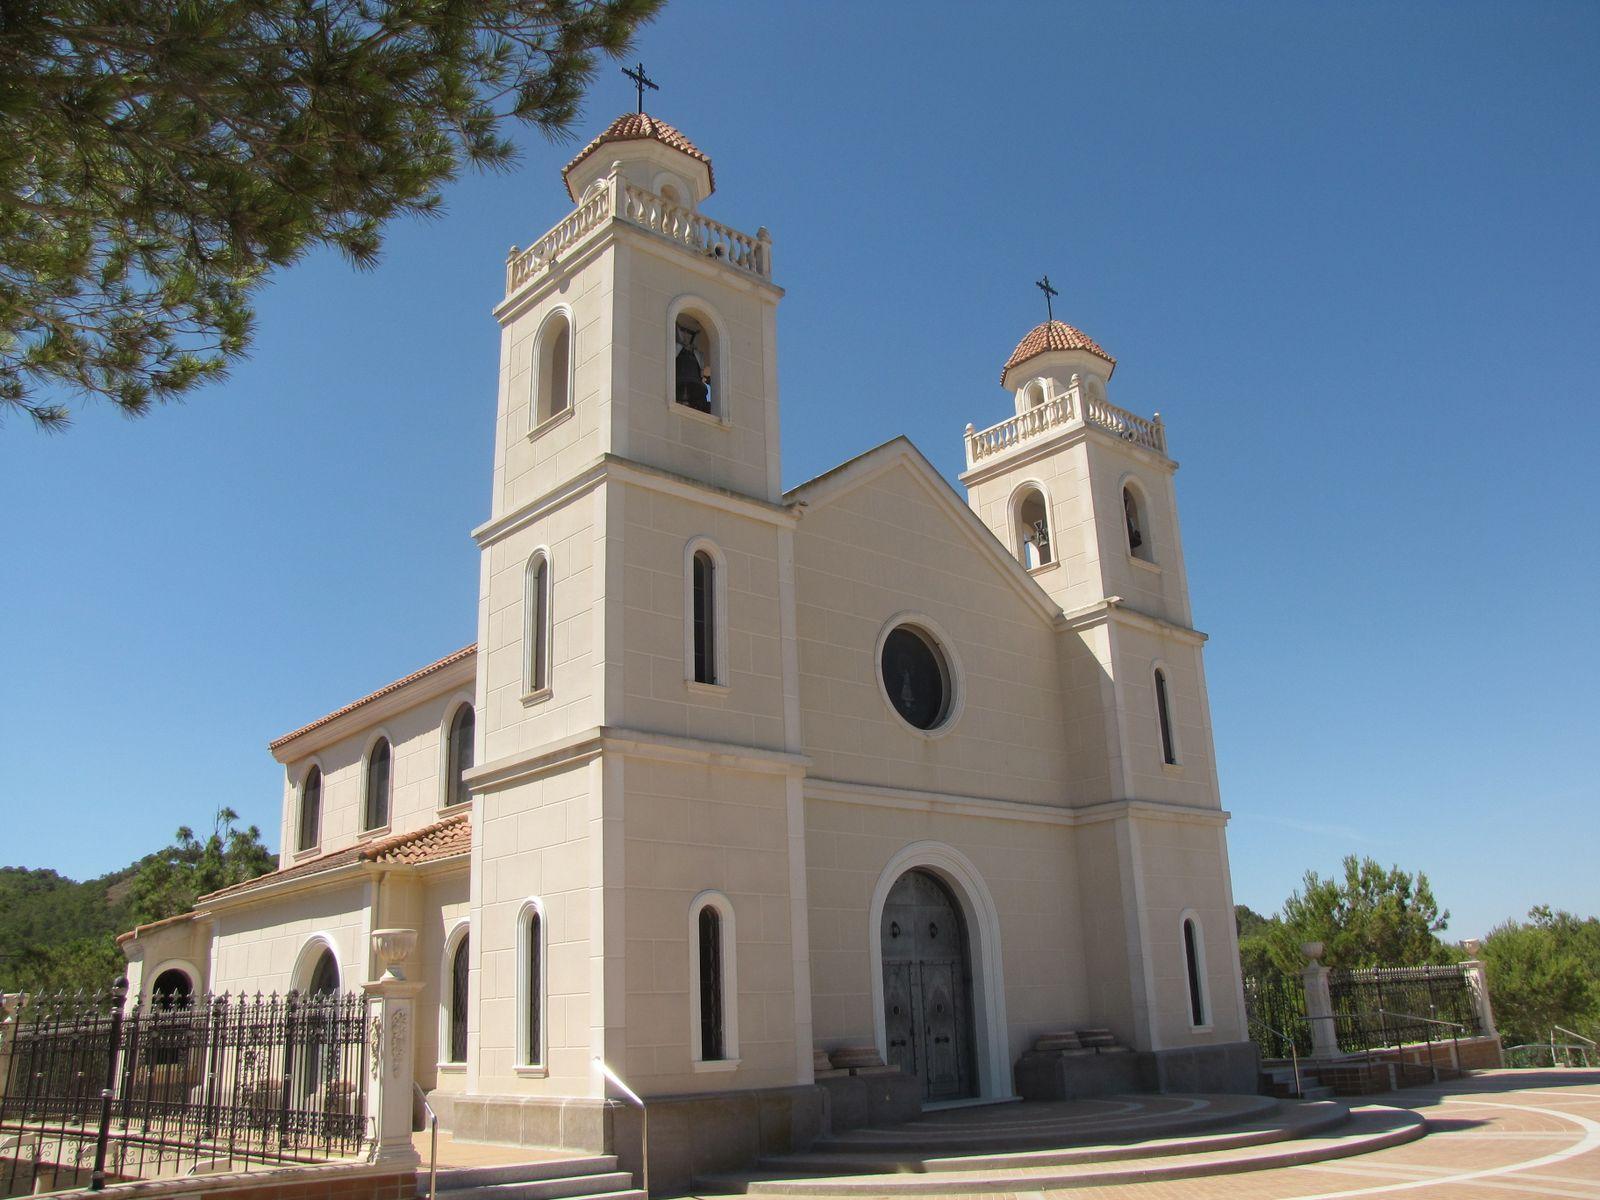 Santuario a la Virgen del Pilar